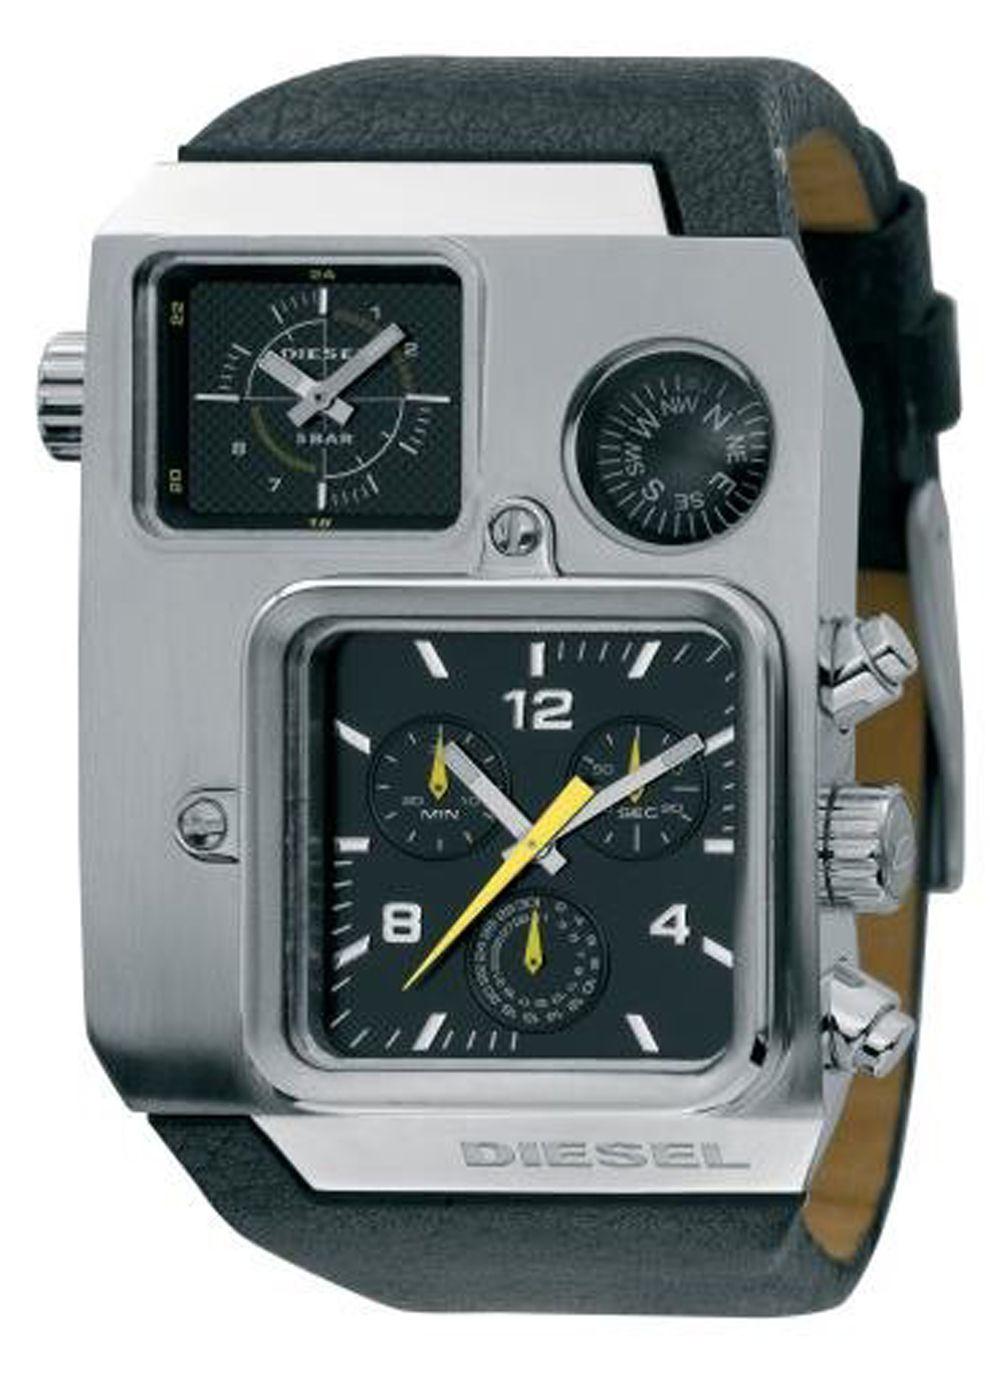 881f85d1a4eb8 Watch Event Men s Watch Diesel   Watches For Men   Pinterest ...